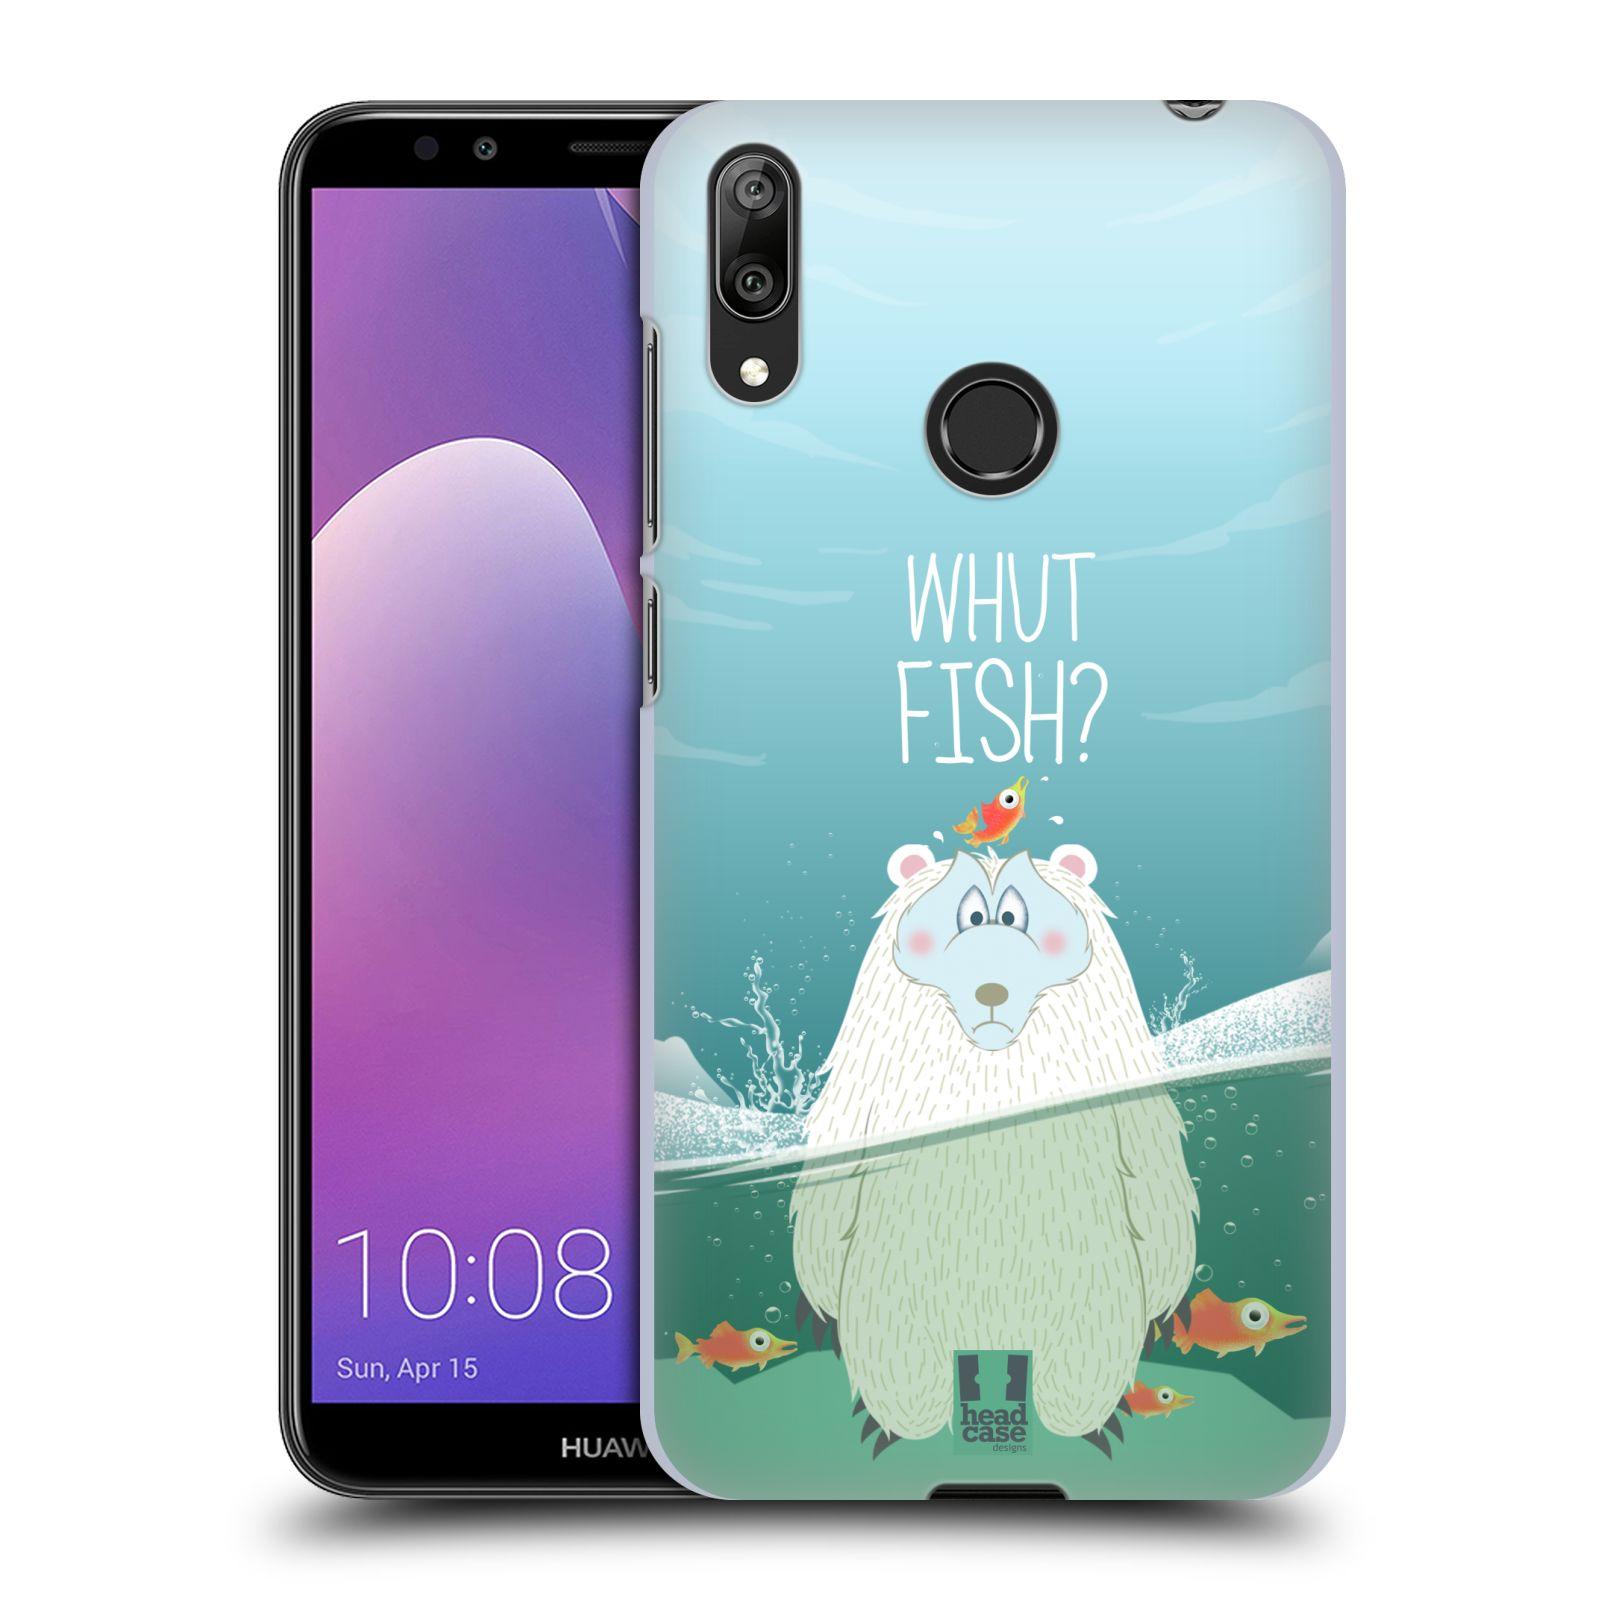 Plastové pouzdro na mobil Huawei Y7 (2019) - Head Case - Medvěd Whut Fish?